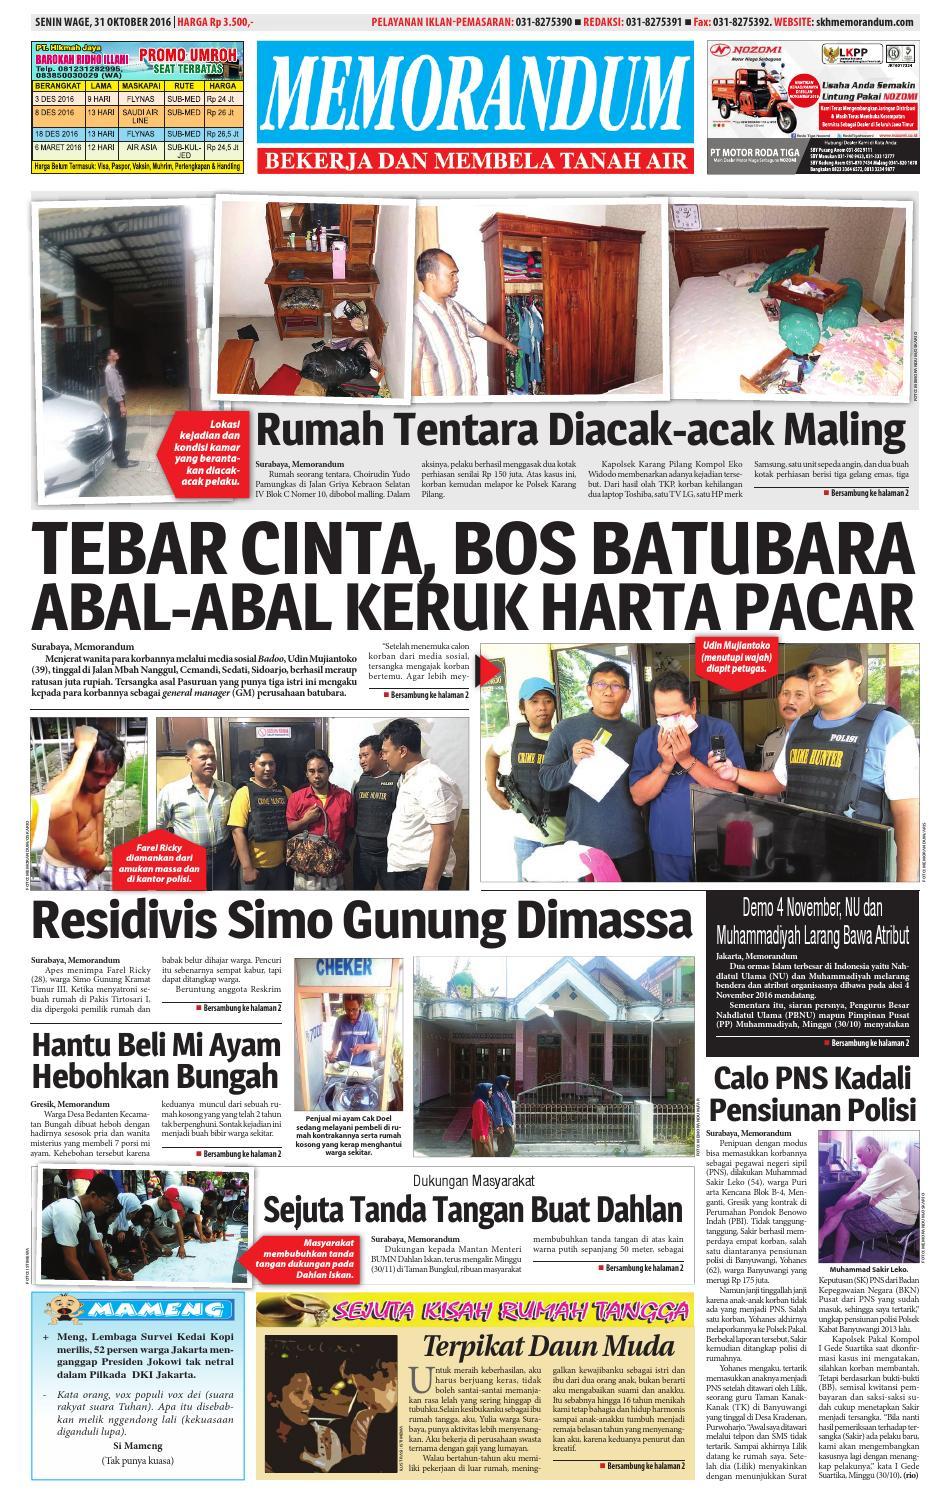 memorandum edisi 31 oktober 2016 by memorandum issuu